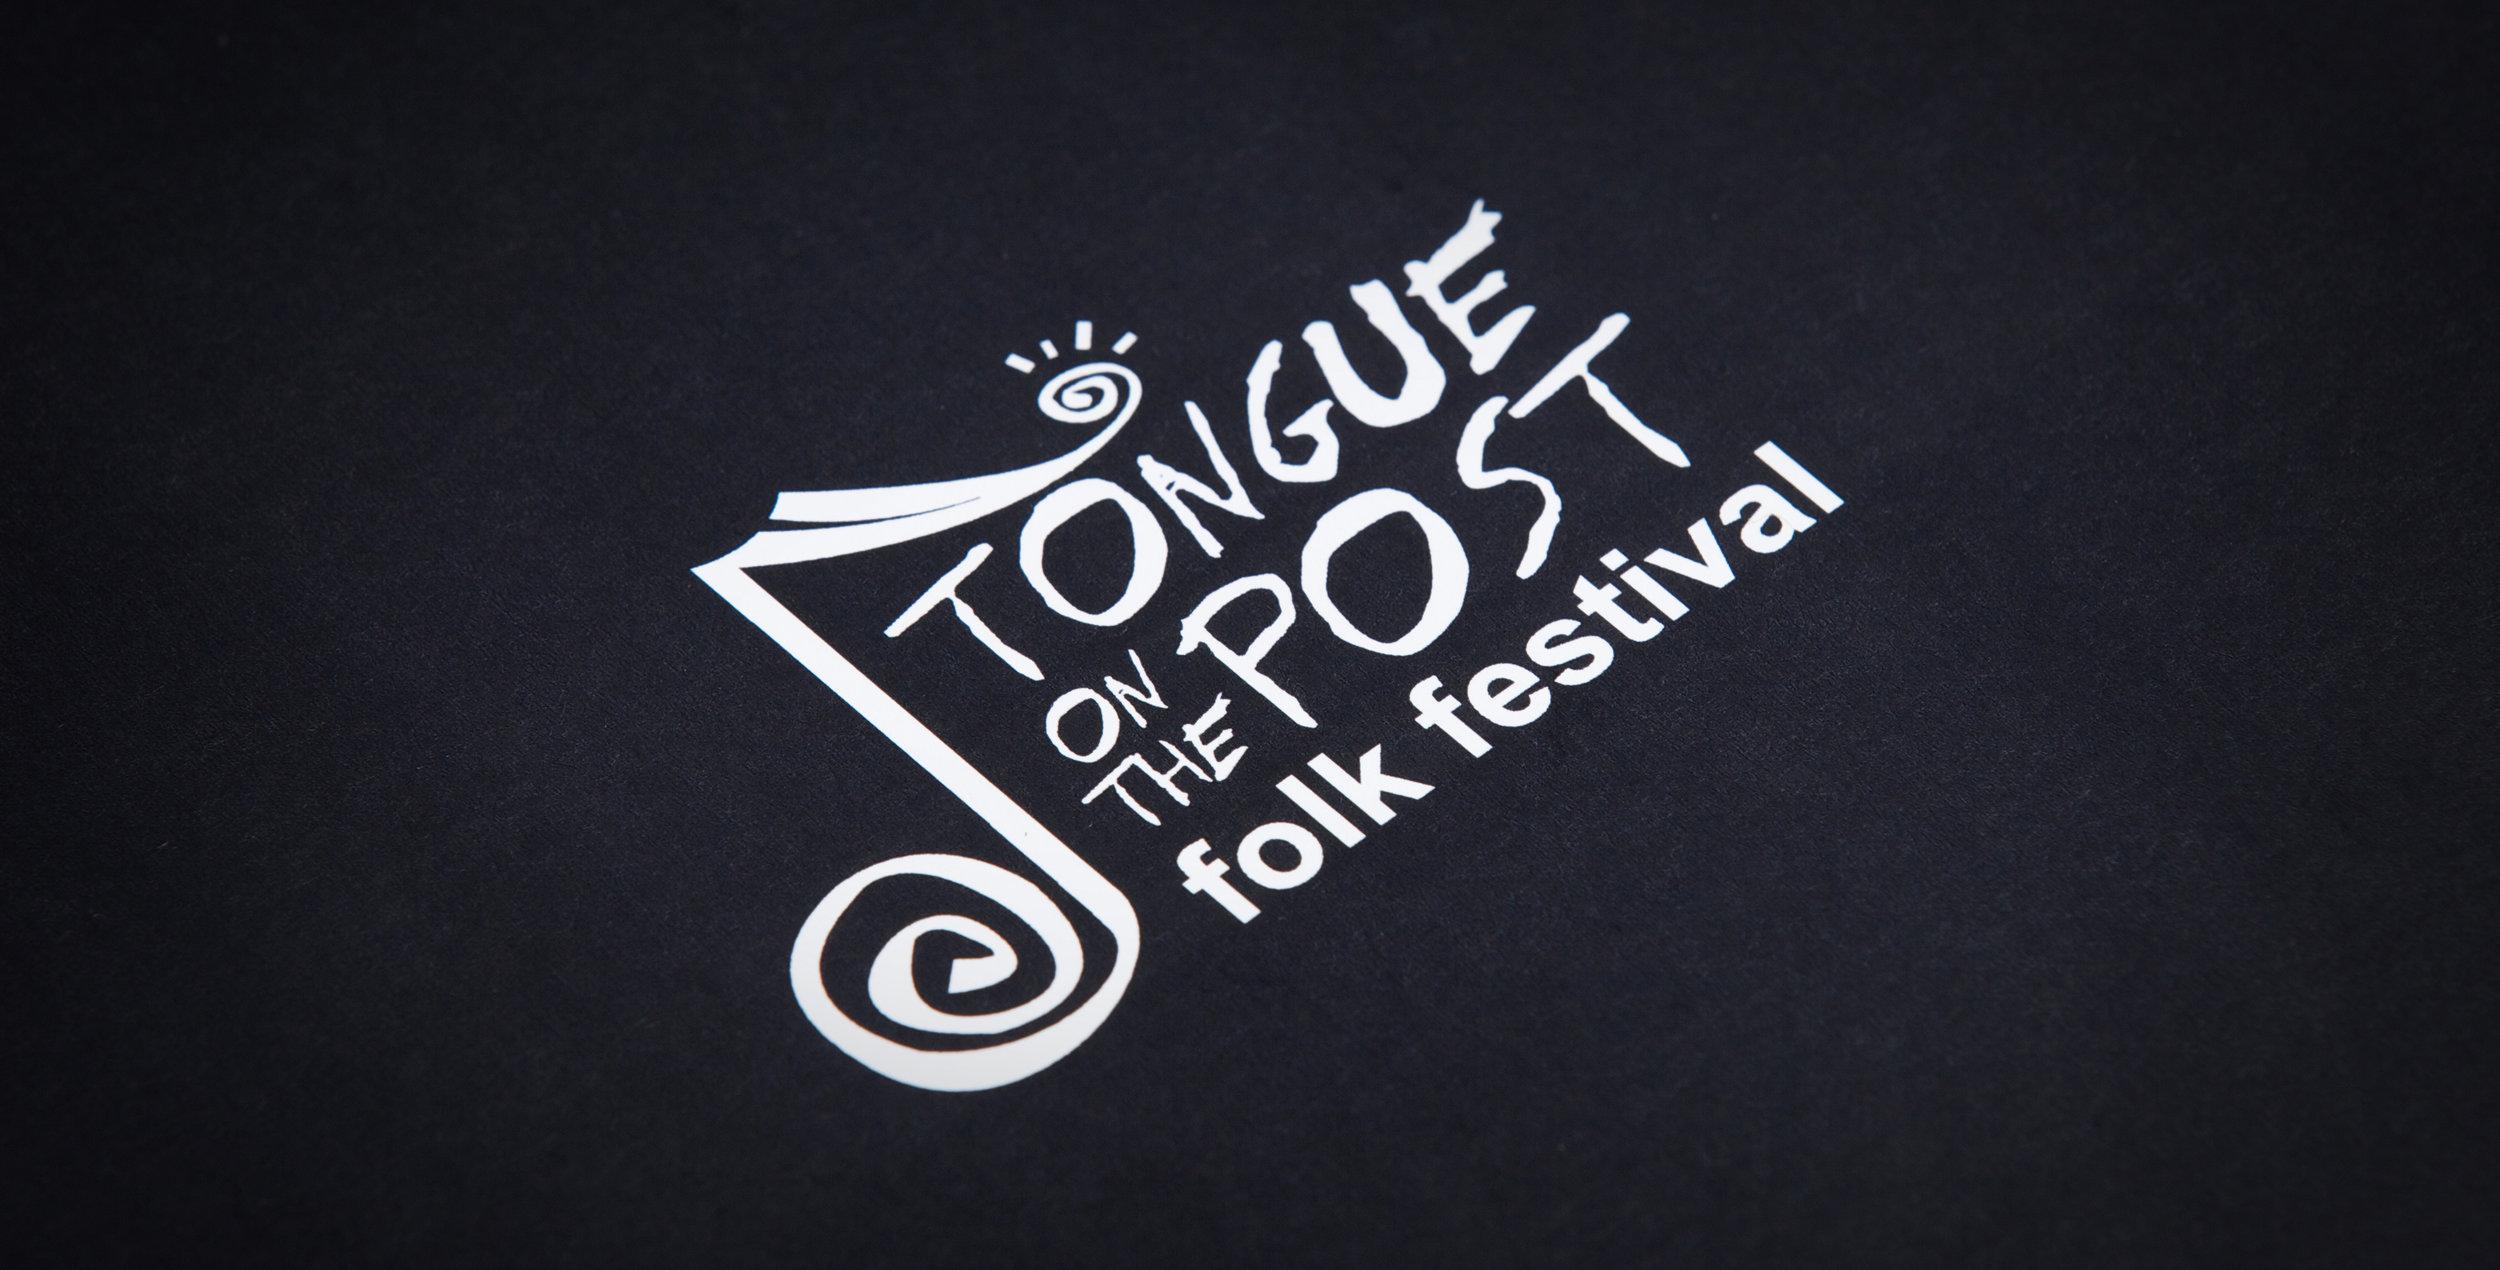 Original tongue on the post folk festival logo design - 2005